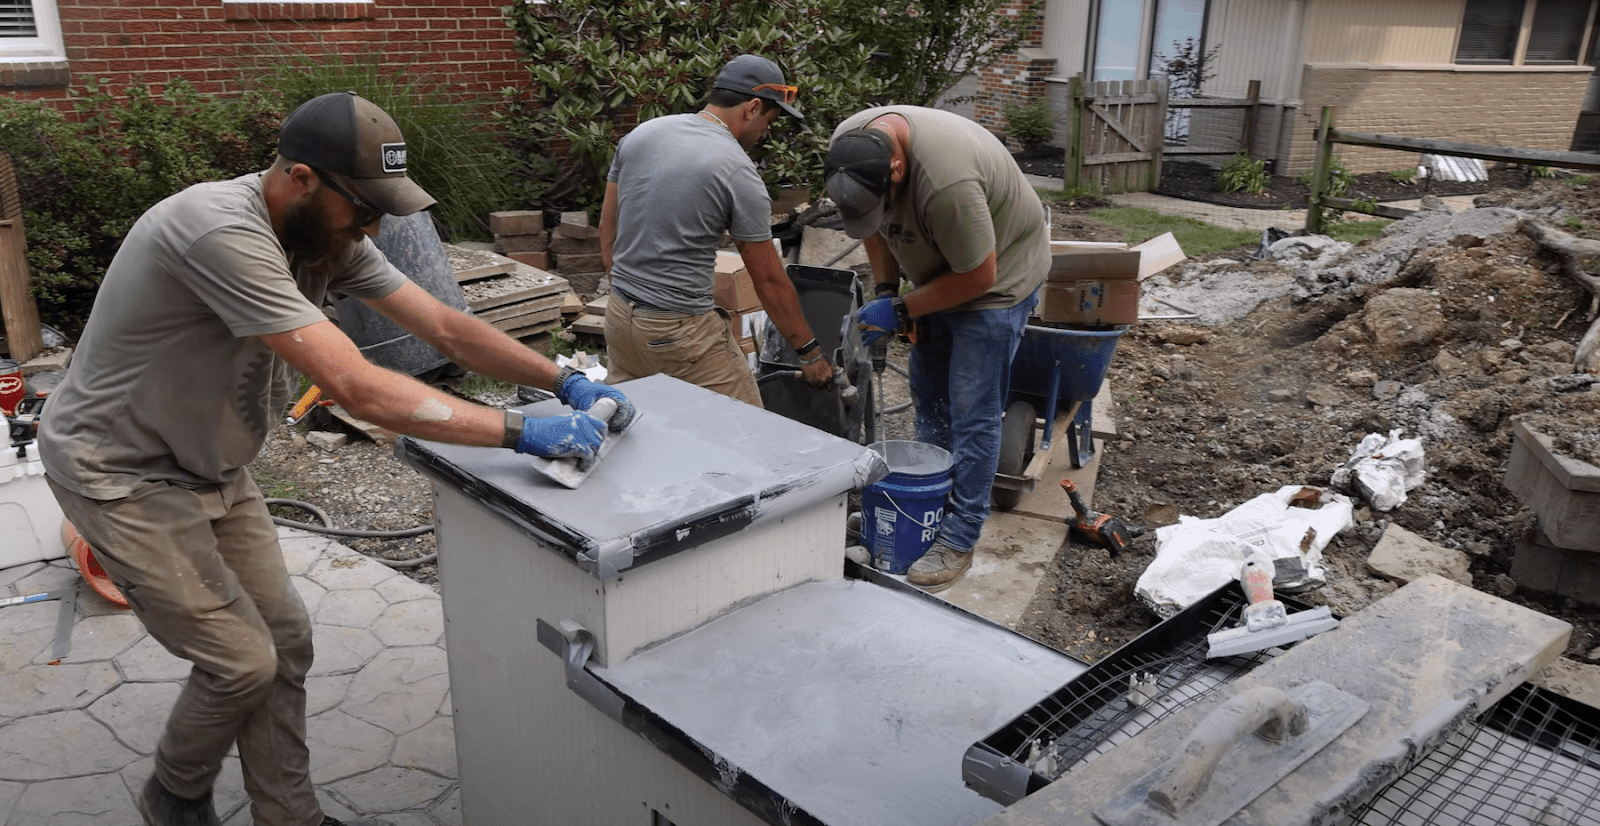 John, Sam, and Jordan working on the cement countertops